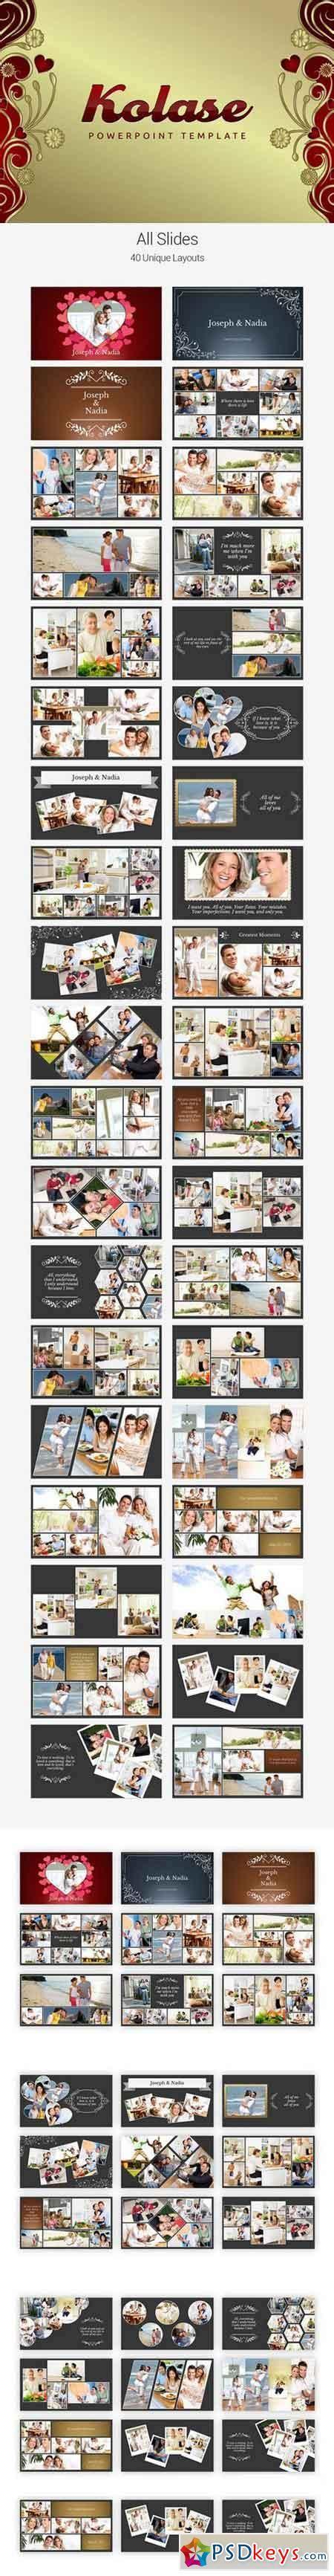 template photoshop kolase kolase powerpoint template 709837 187 free download